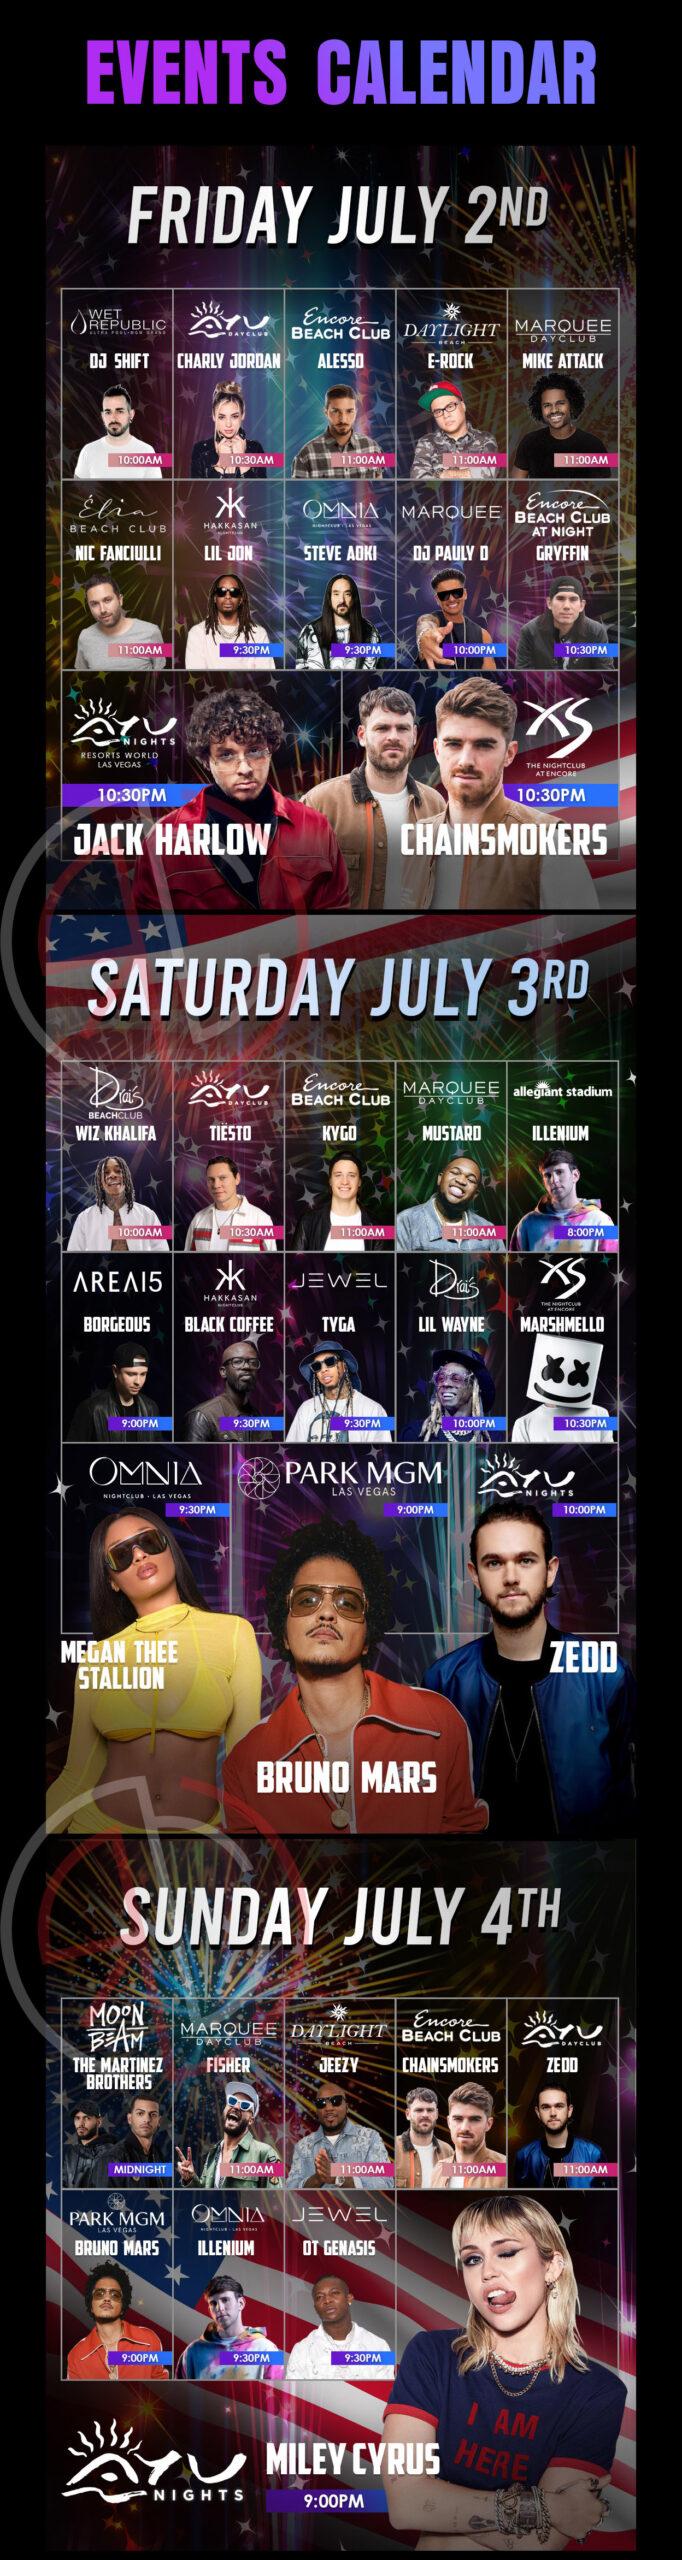 las vegas nightclub and dayclub july 4th of july weekend events